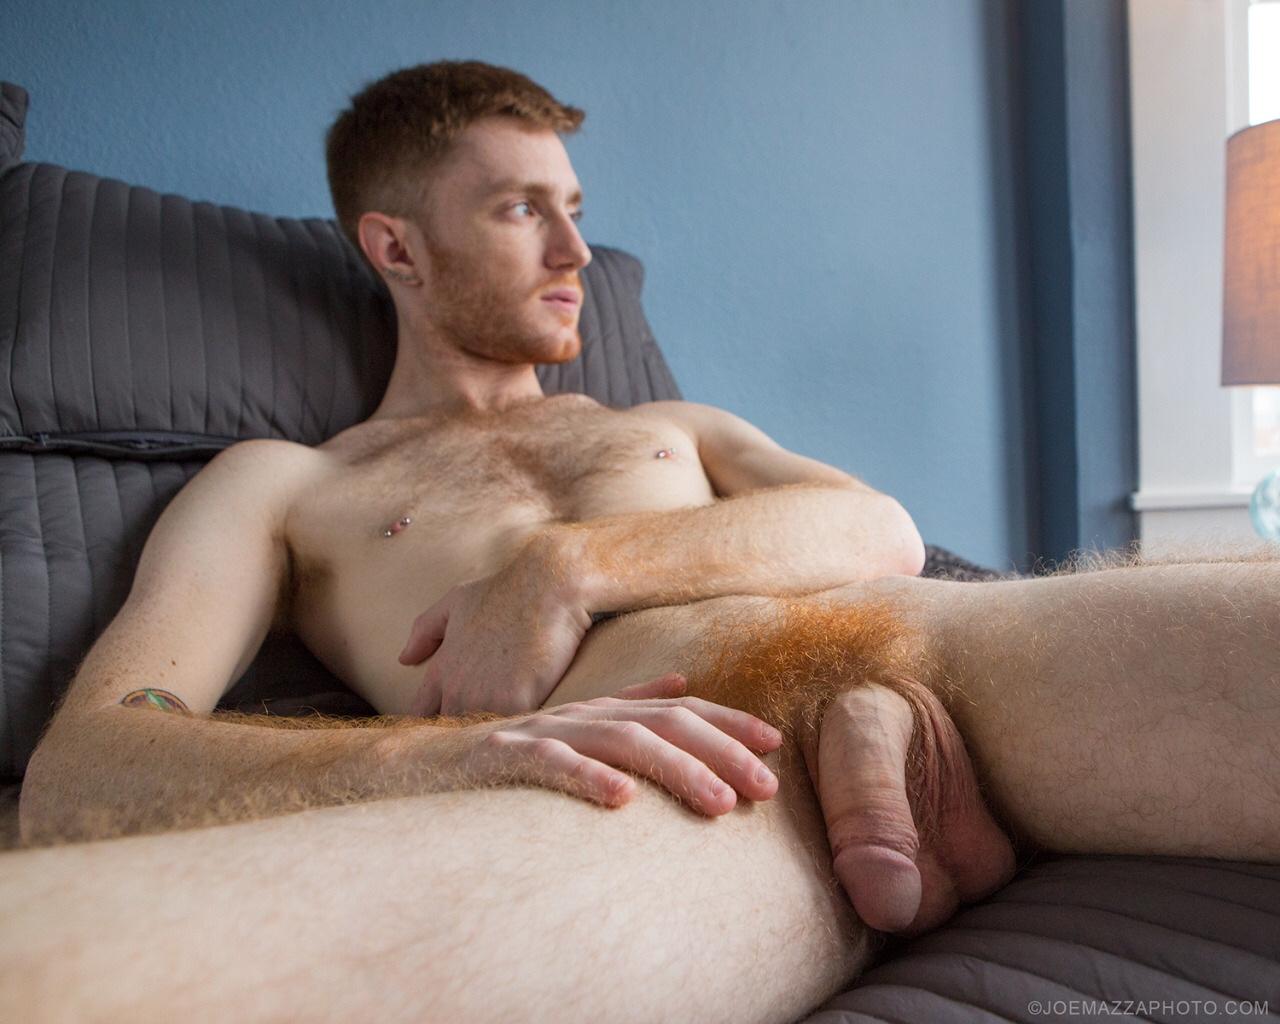 Redhead nude male pics — img 14